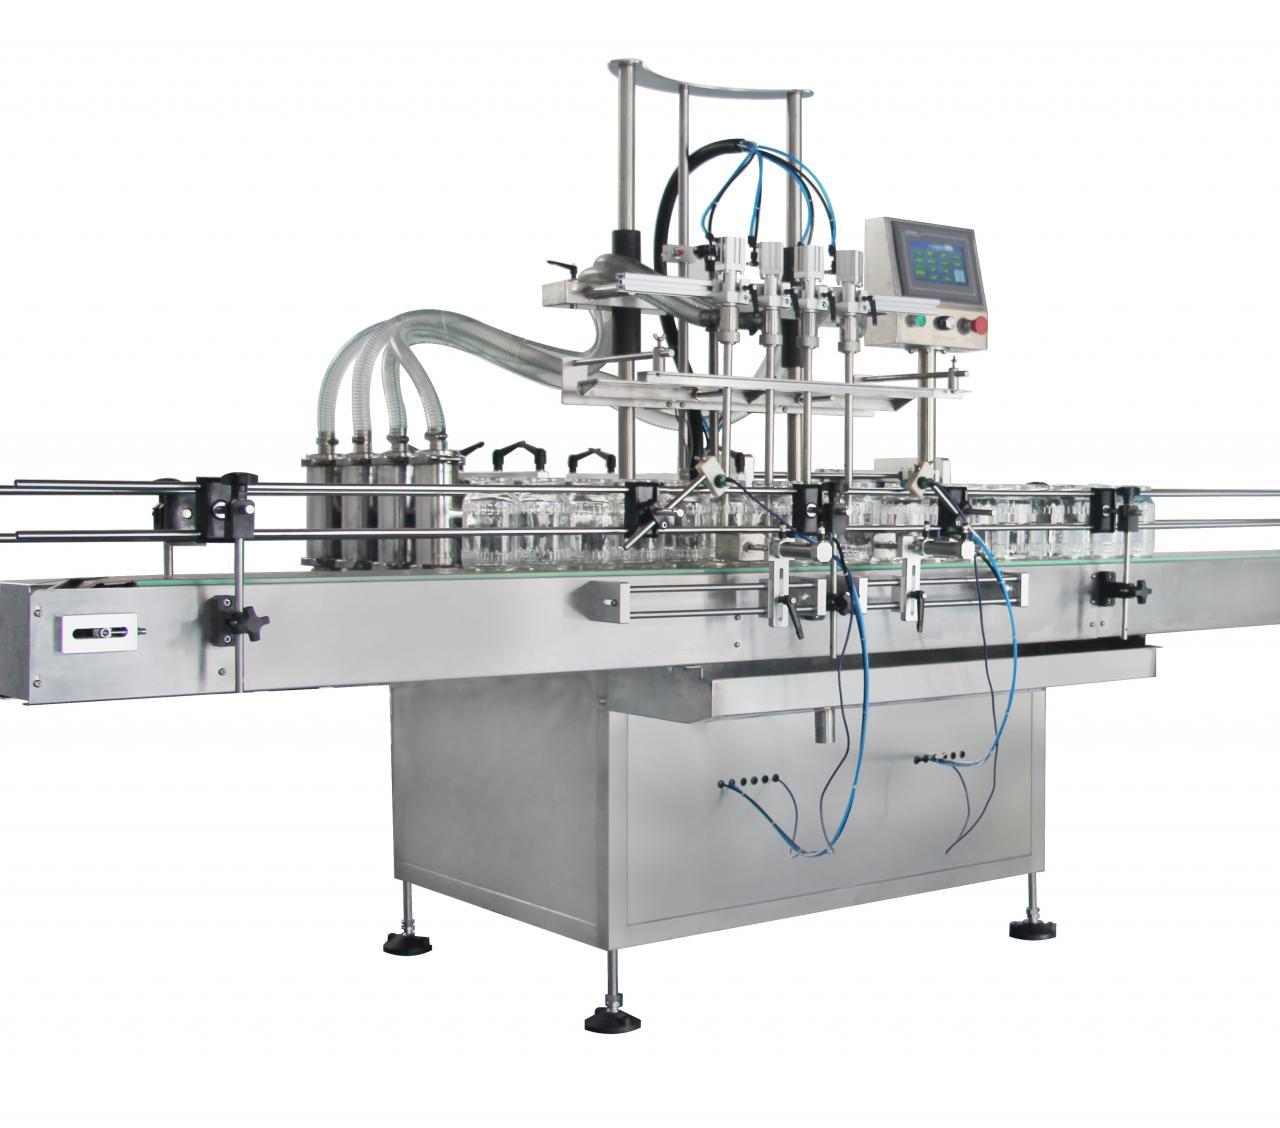 Npack Linear Type Automatic Servo Motor Driven Piston 100ml-1l Filling Machine for Shampoo Shower Gel